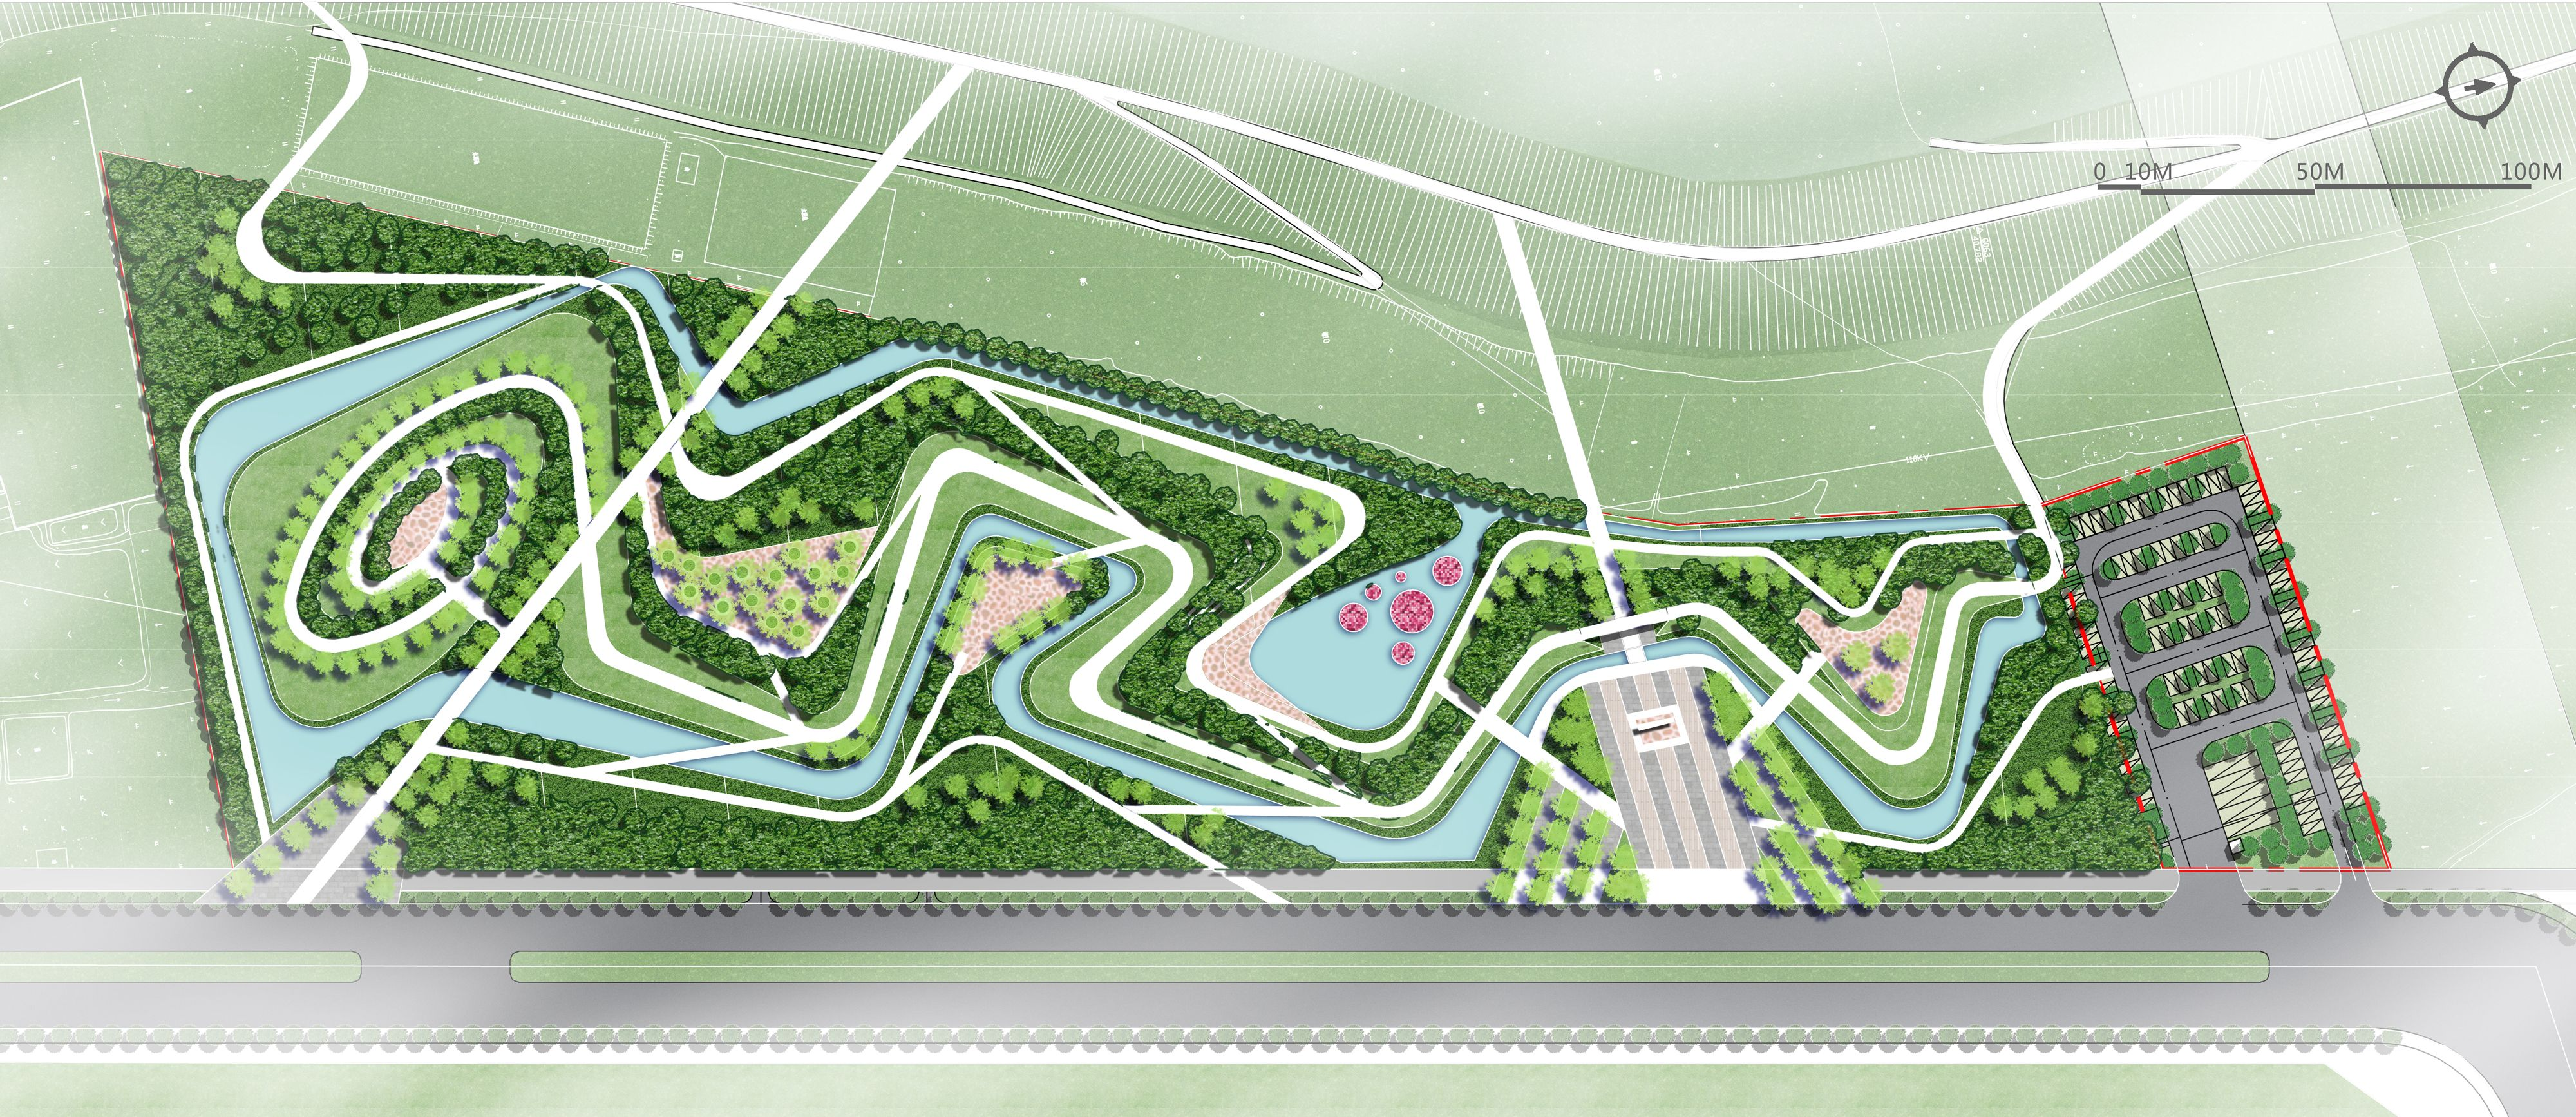 Landscape Plans Designs Contemporary Master Plan Architects Landscaping Park Urban Design Style